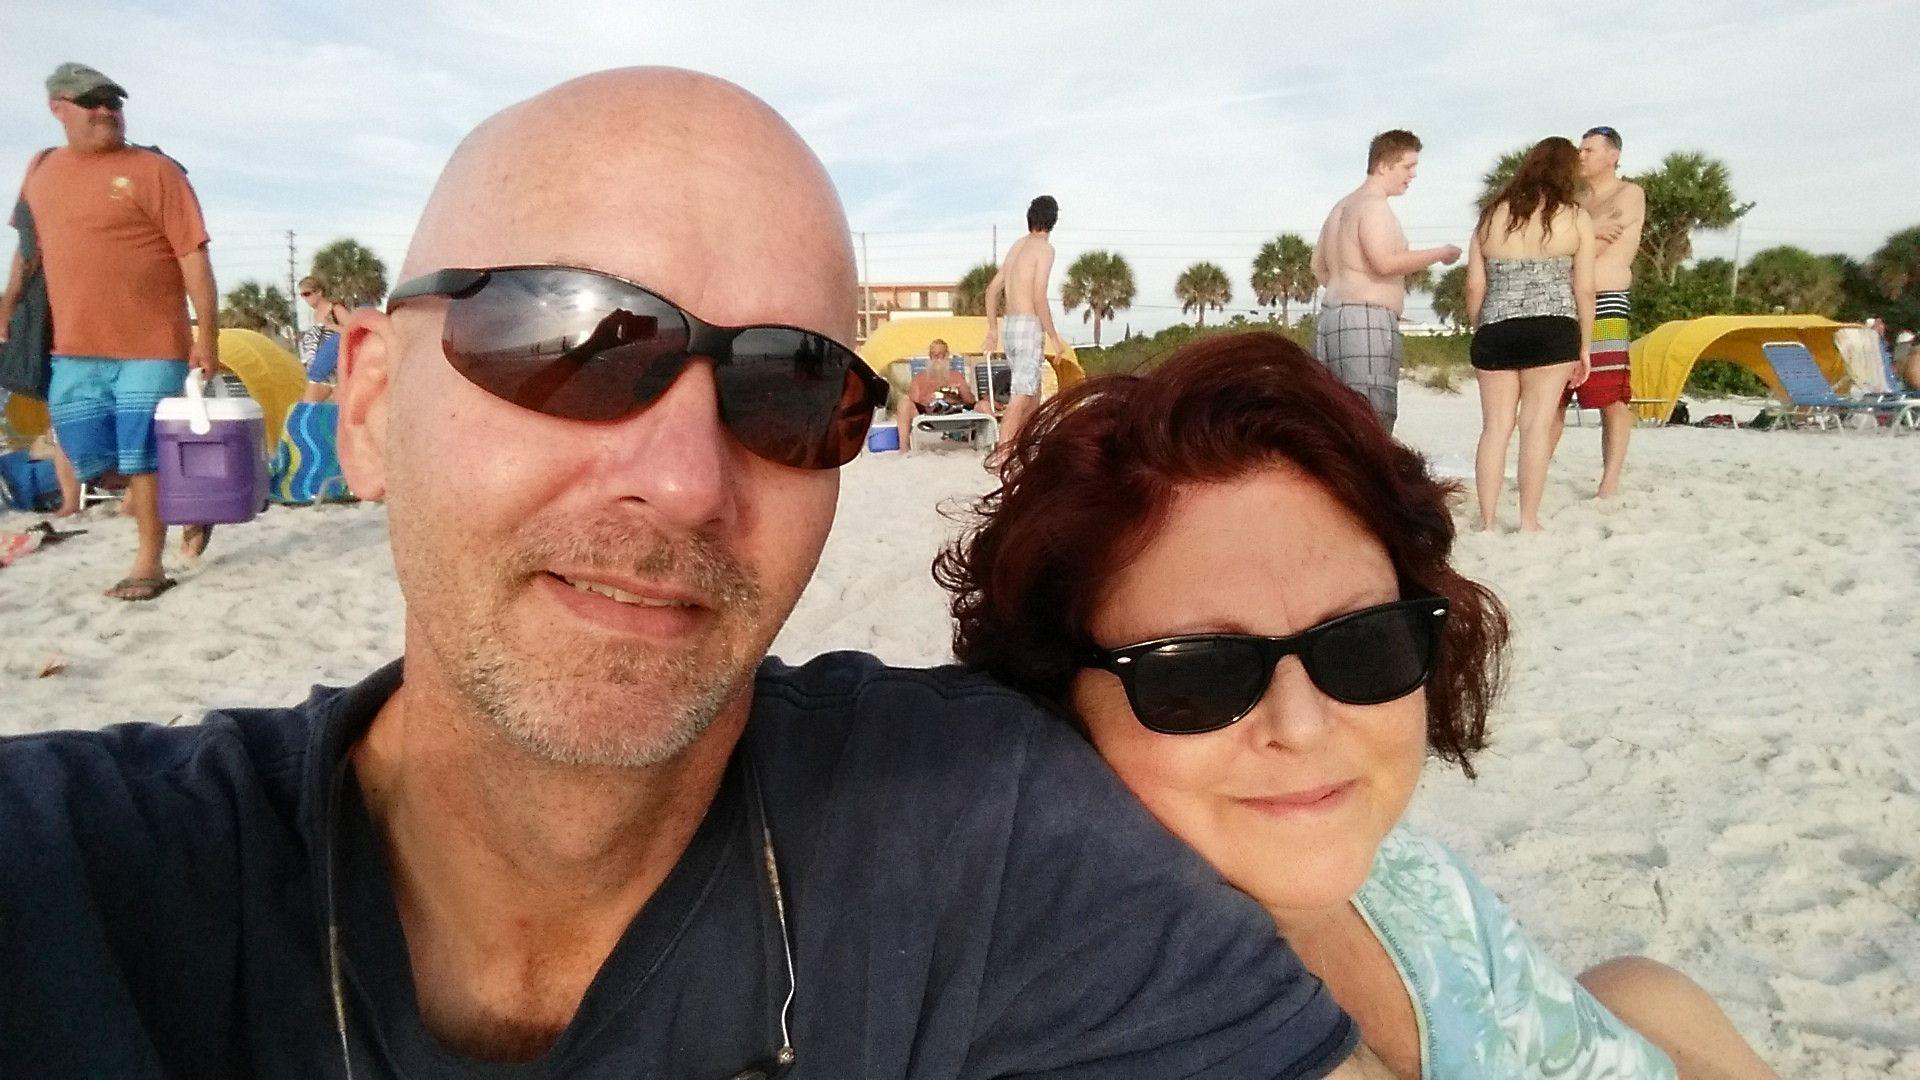 Florida Community Of Mindfulness Meetup (Tampa